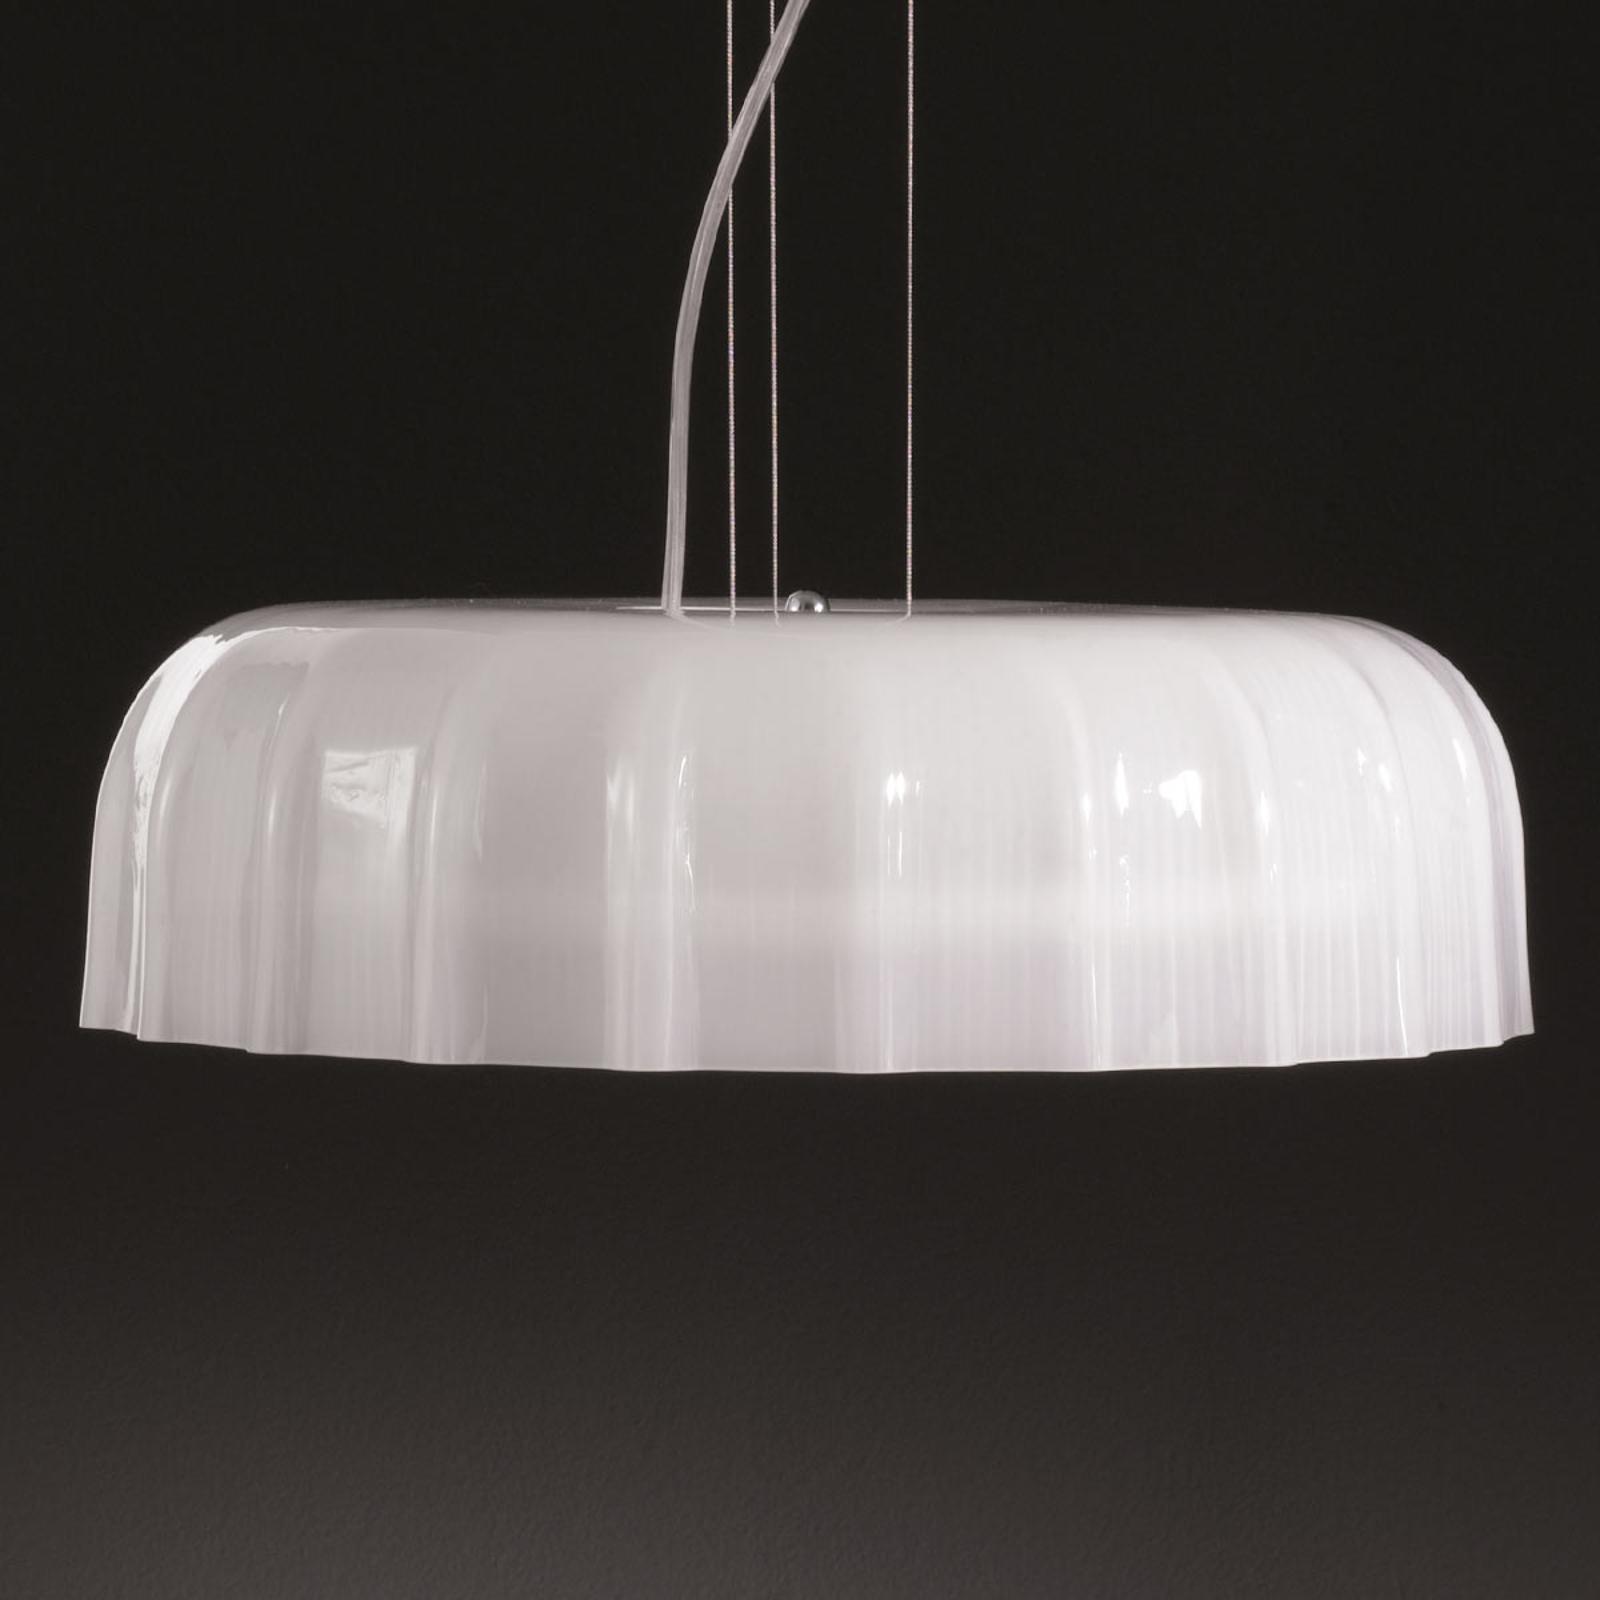 Moderne hanglamp Big Cap wit